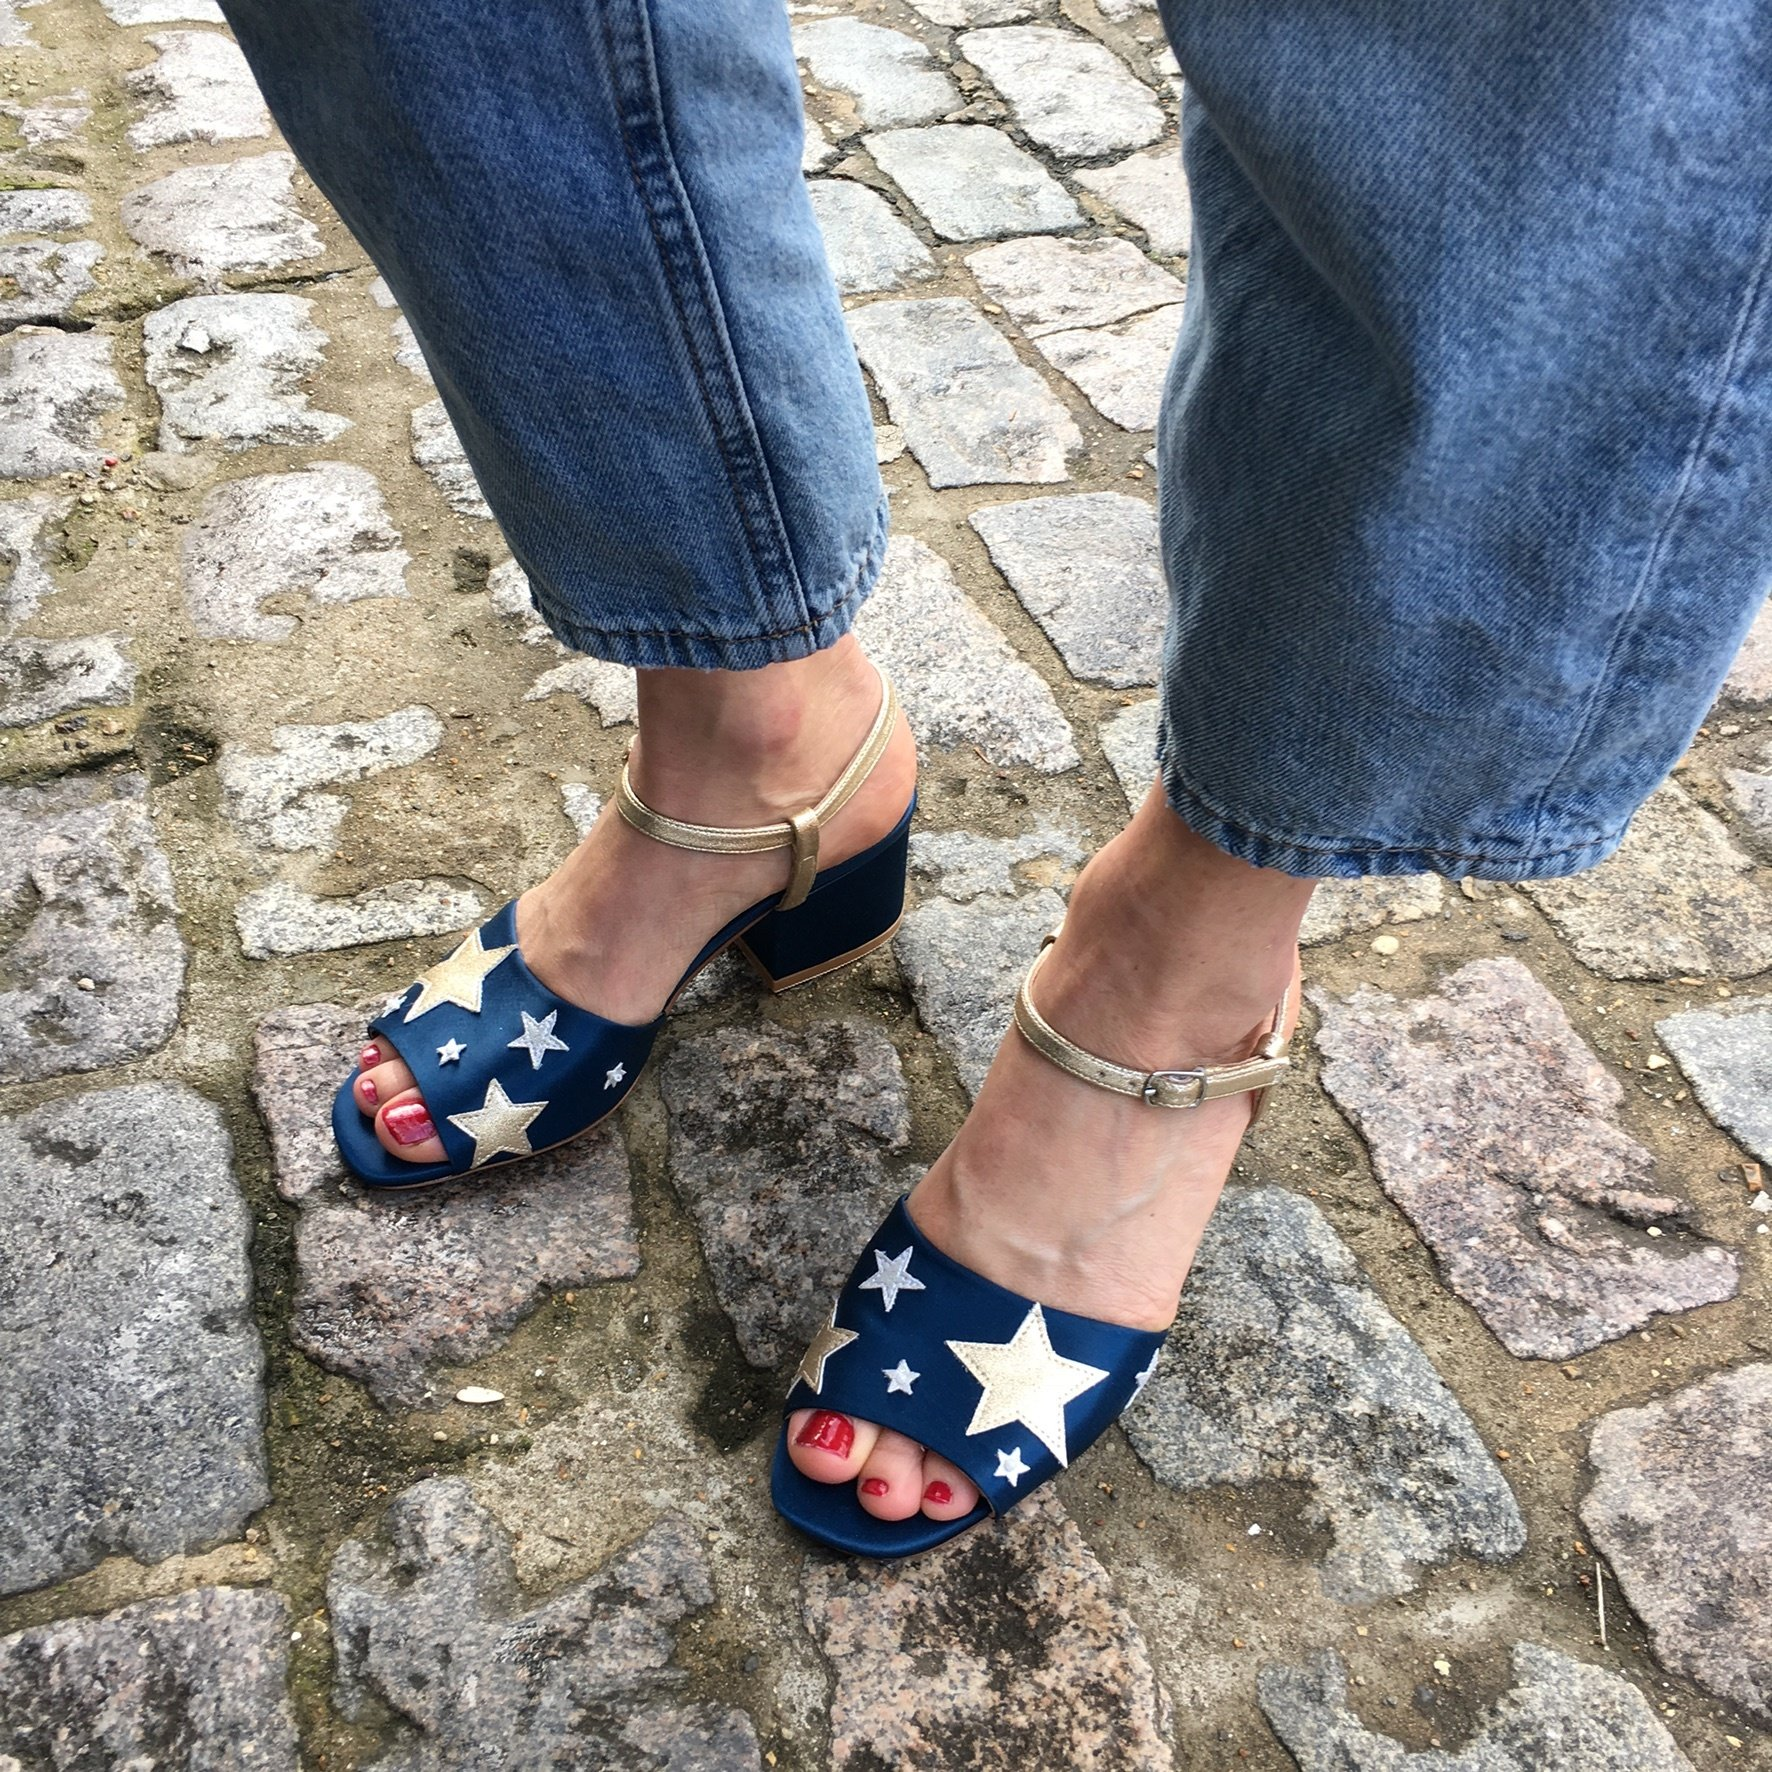 Pearl&stud newington teal star sandals